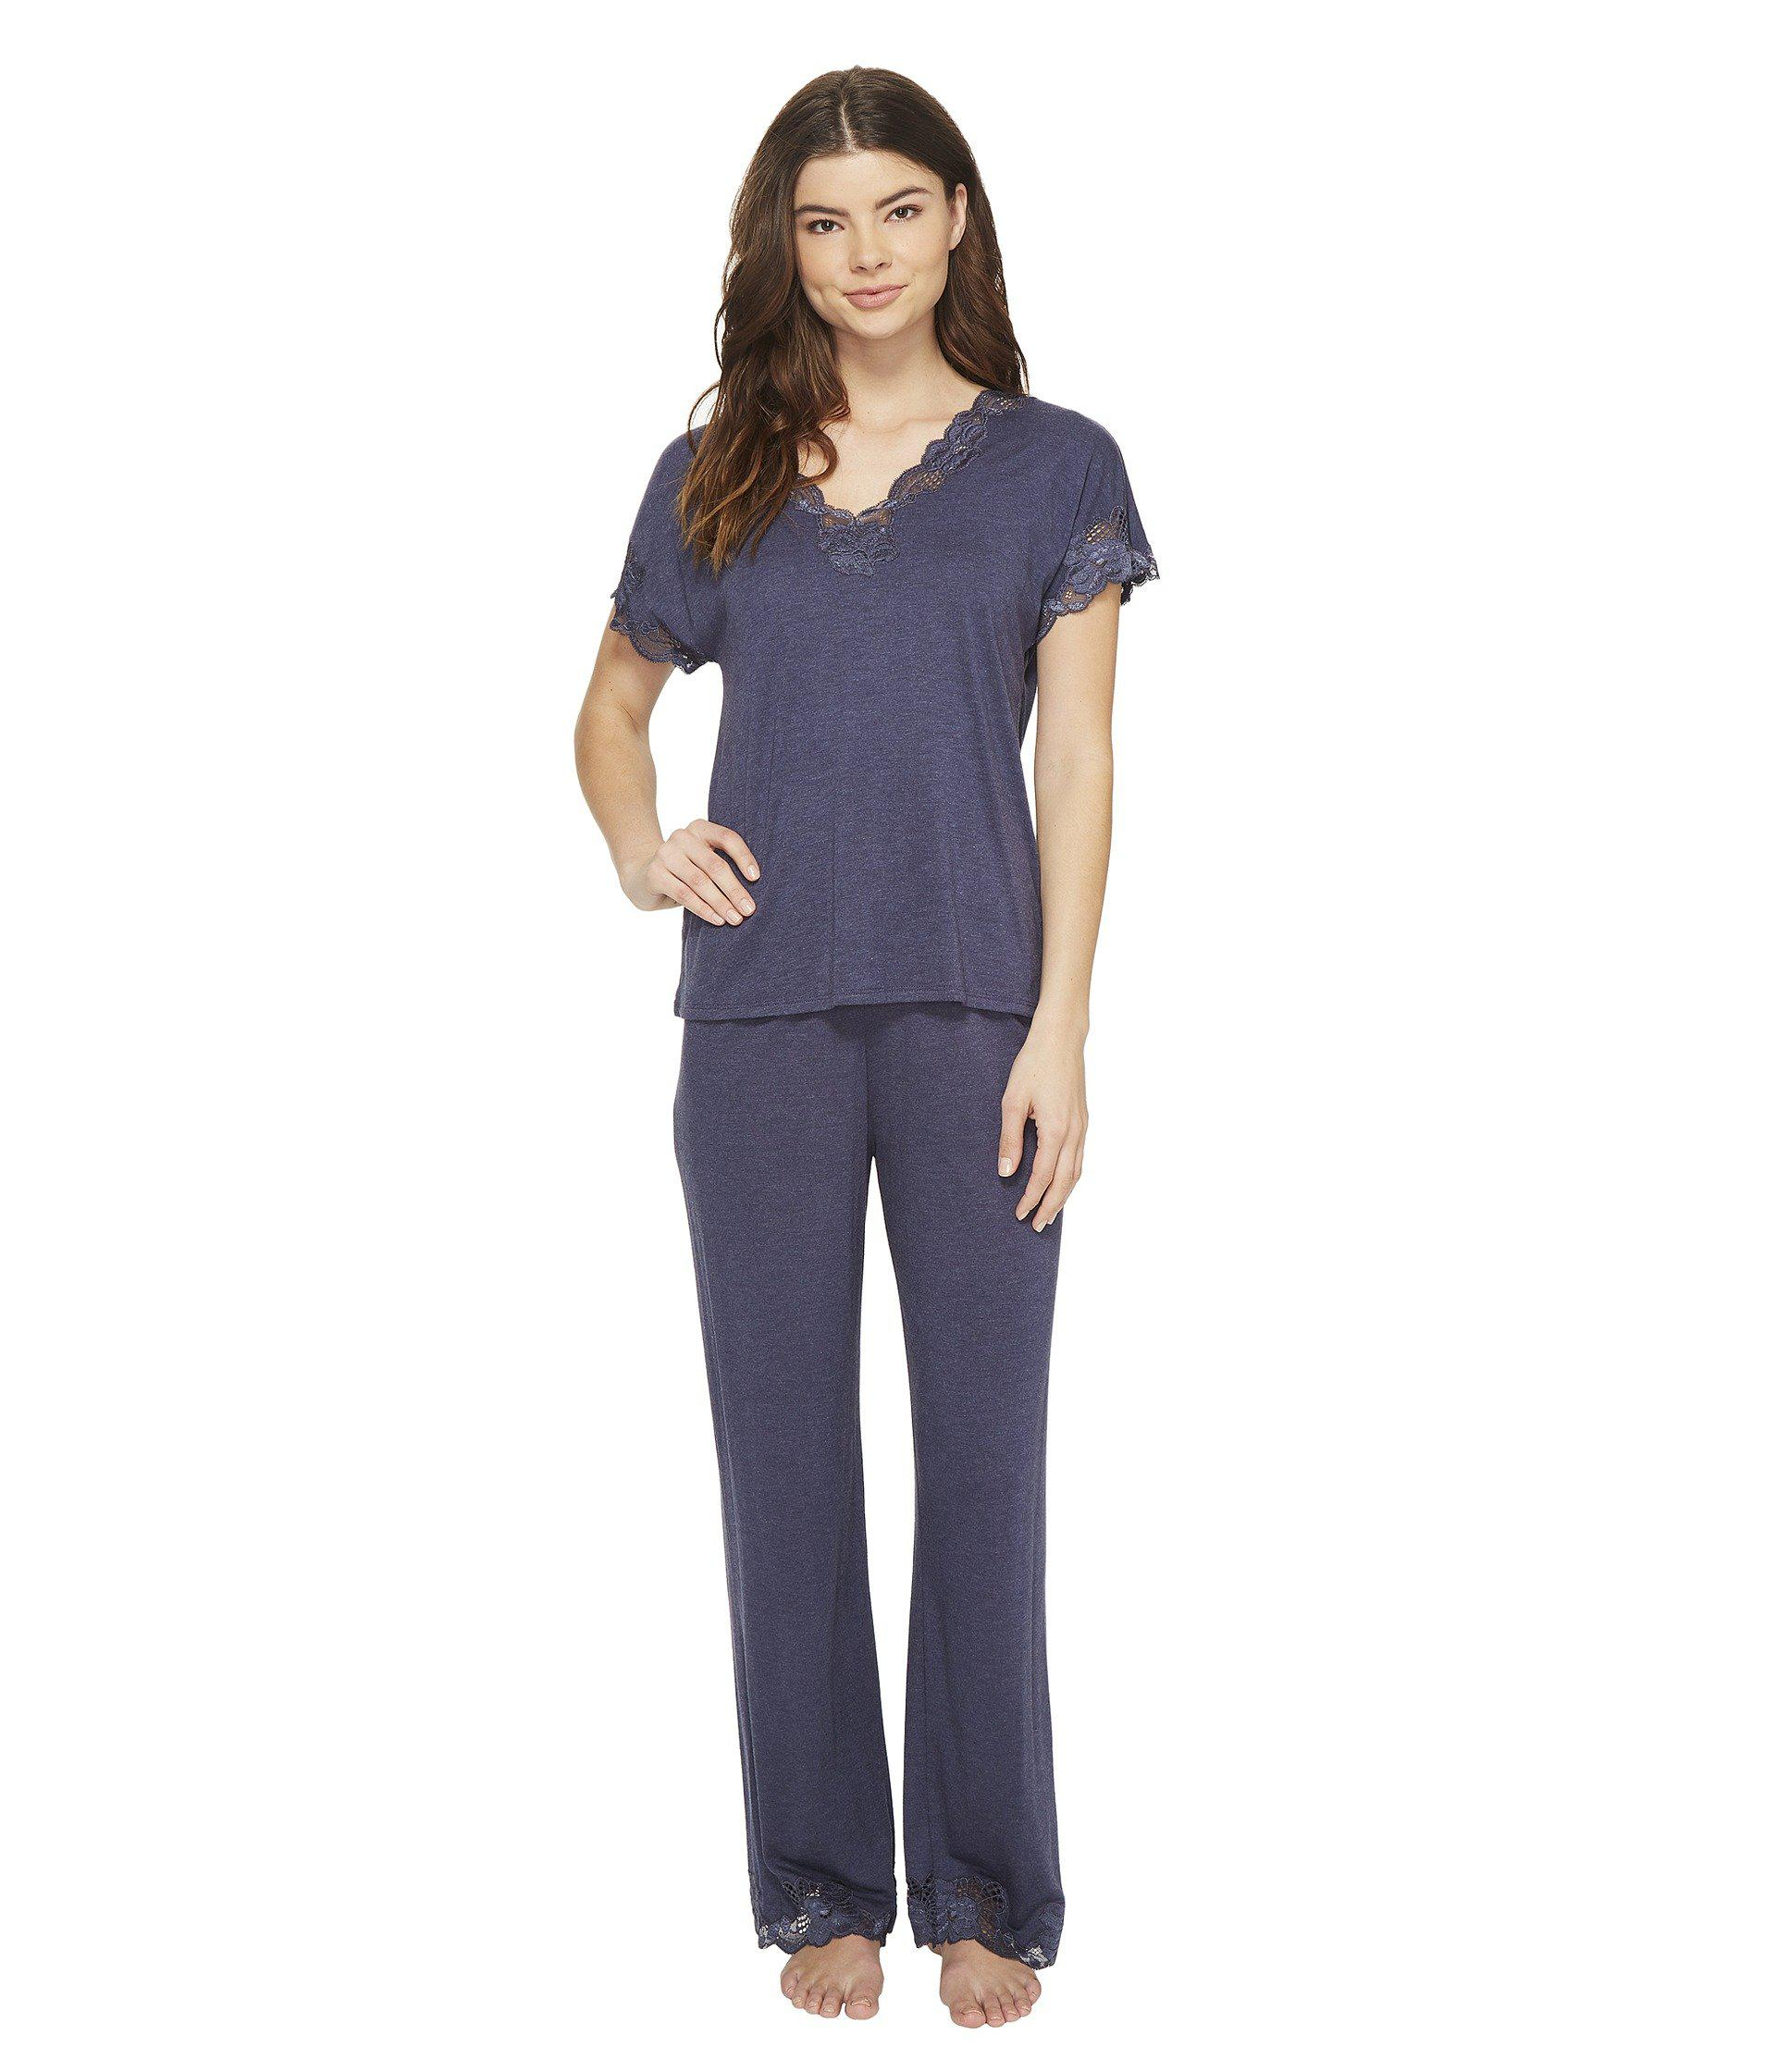 df268ffbd4e9 Lyst - Natori Zen Floral S s Pj (heather Night Blue) Women s Pajama ...